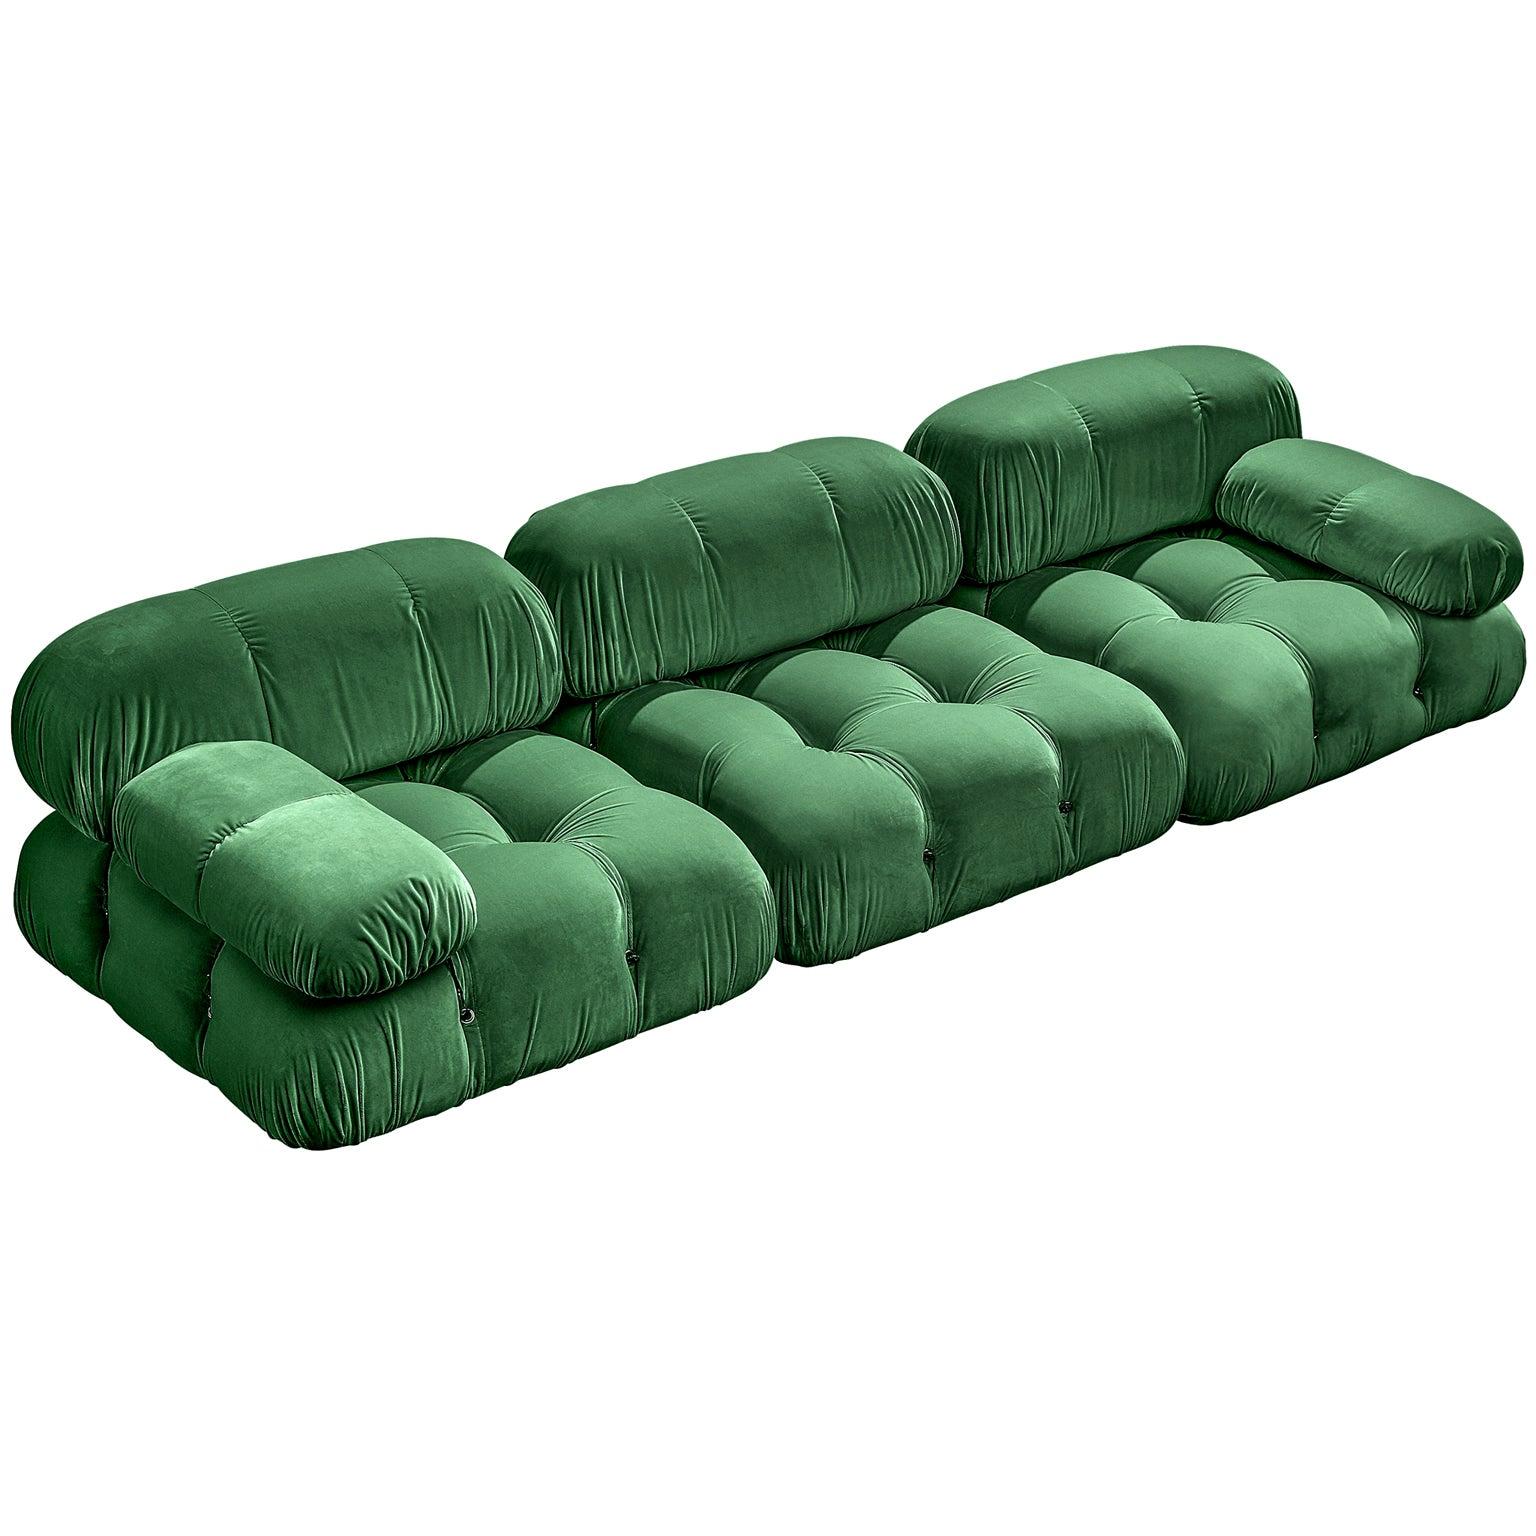 Customizable Mario Bellini 'Camaleonda' Sofa in Emerald Green Velvet